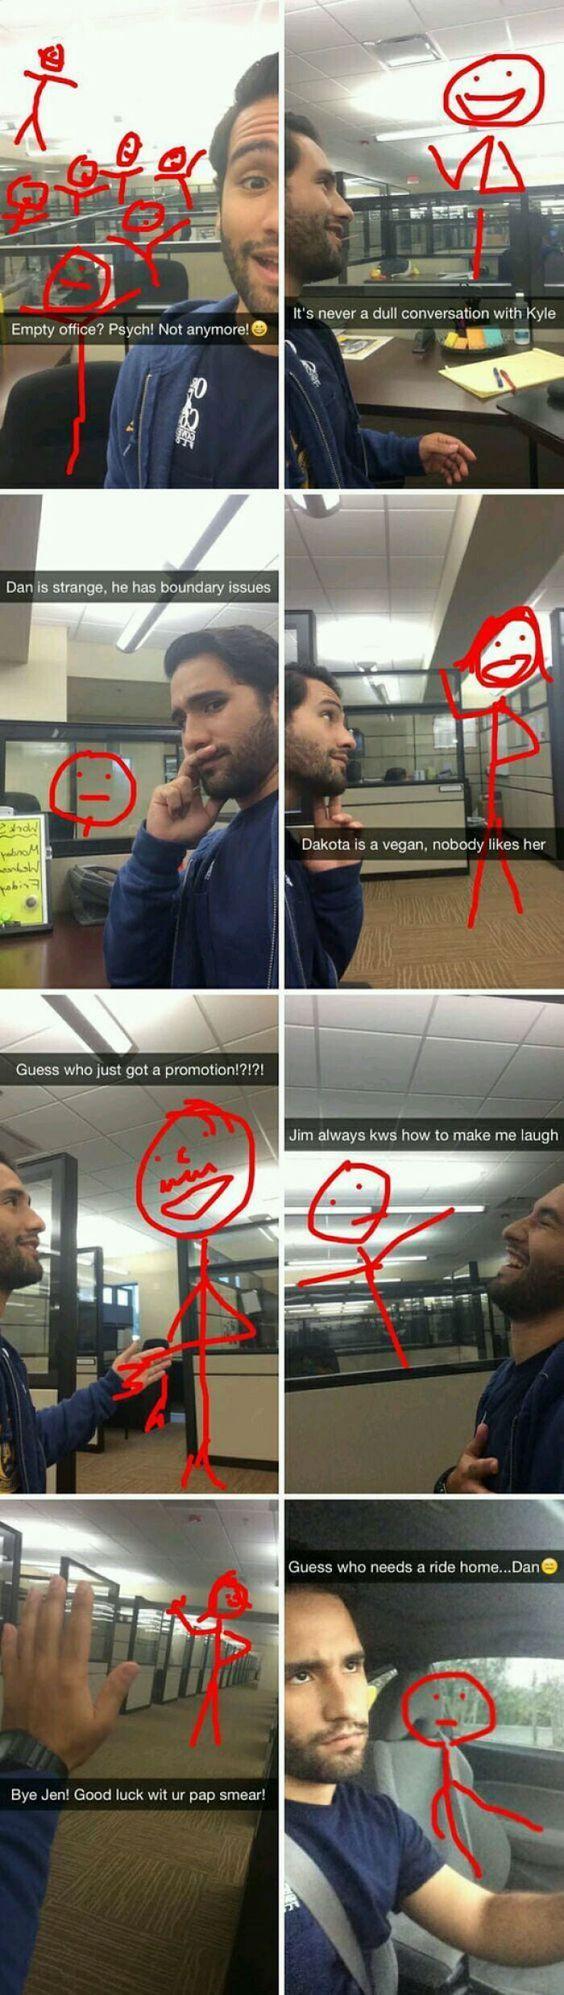 Super Bored At Work Meme